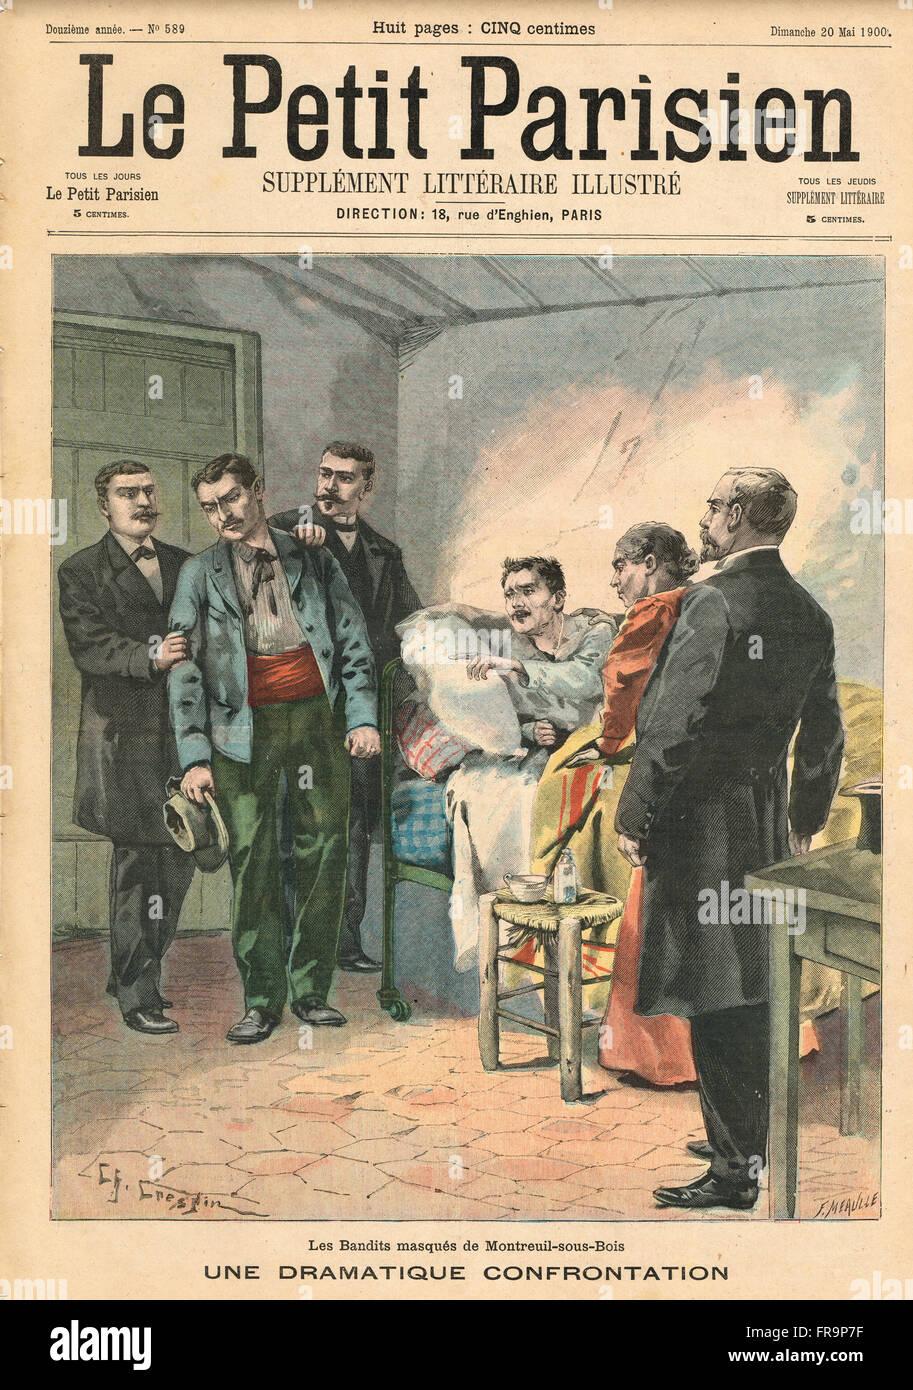 Masked bandits betrayal, Montreuil France 1900 - Stock Image